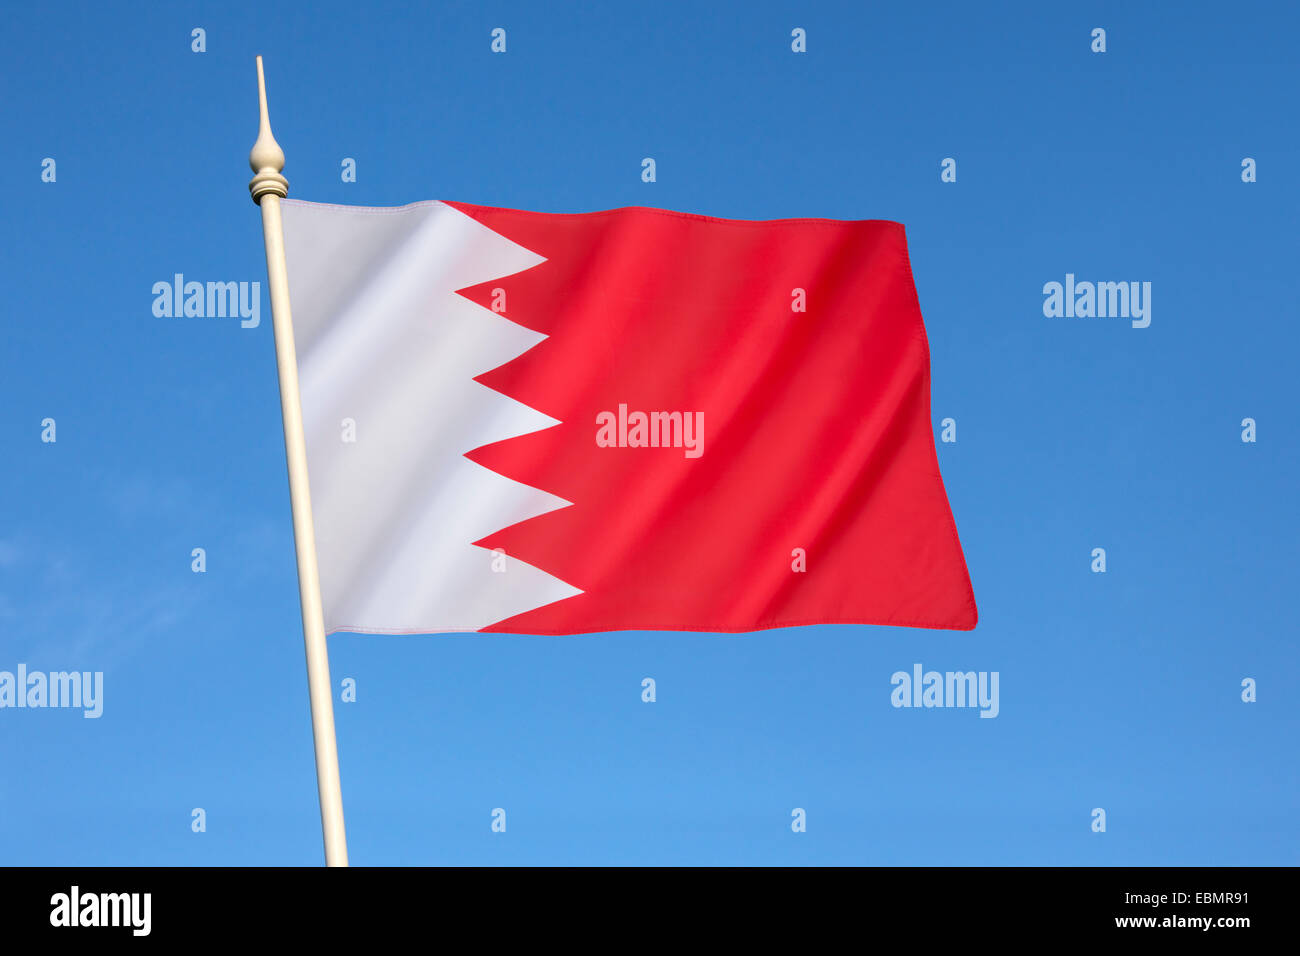 Drapeau de Bahreïn Photo Stock